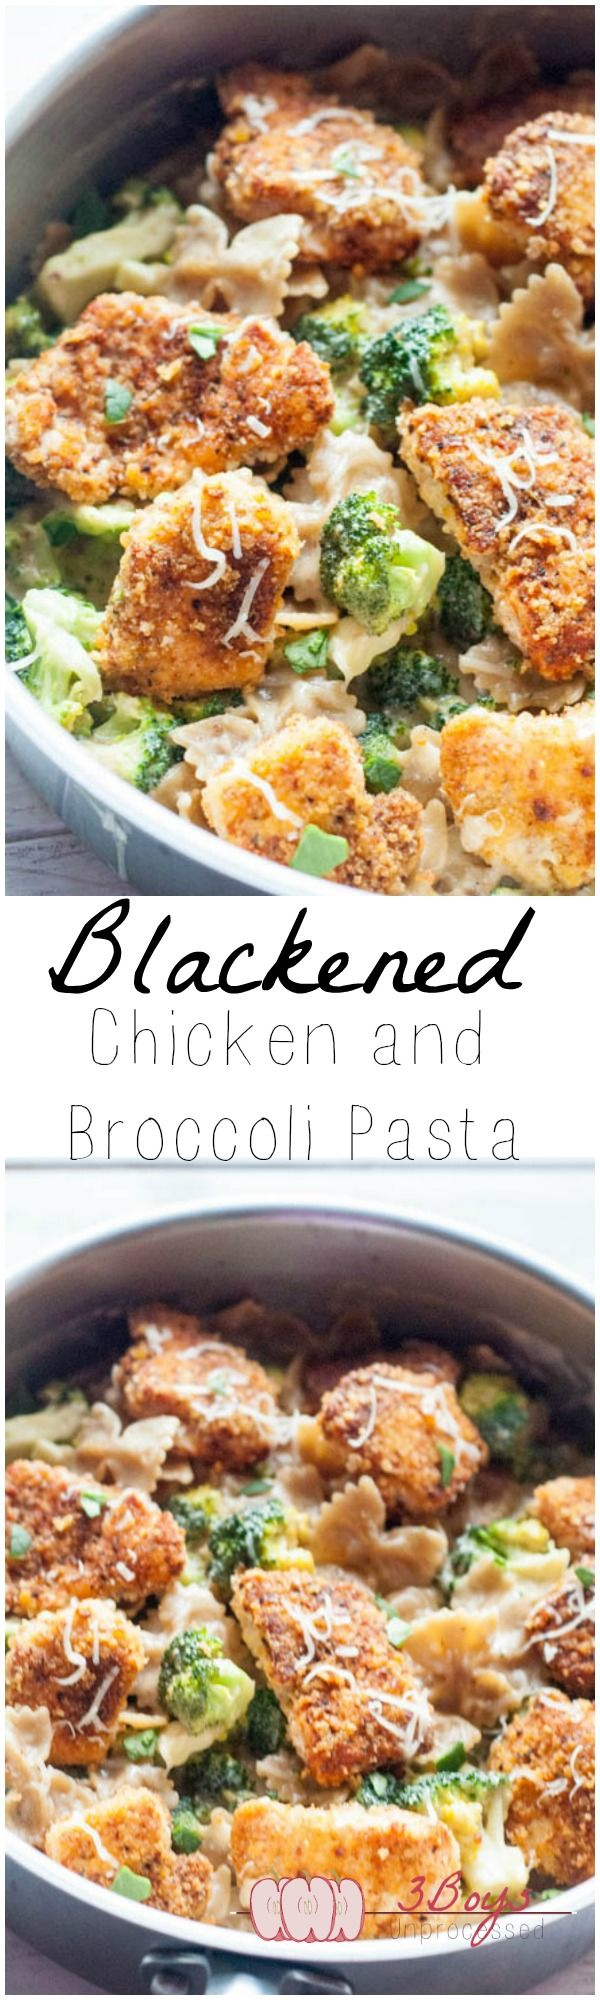 Crispy Blackened Chicken and Broccoli Pasta    www.3boysunprocessed.com